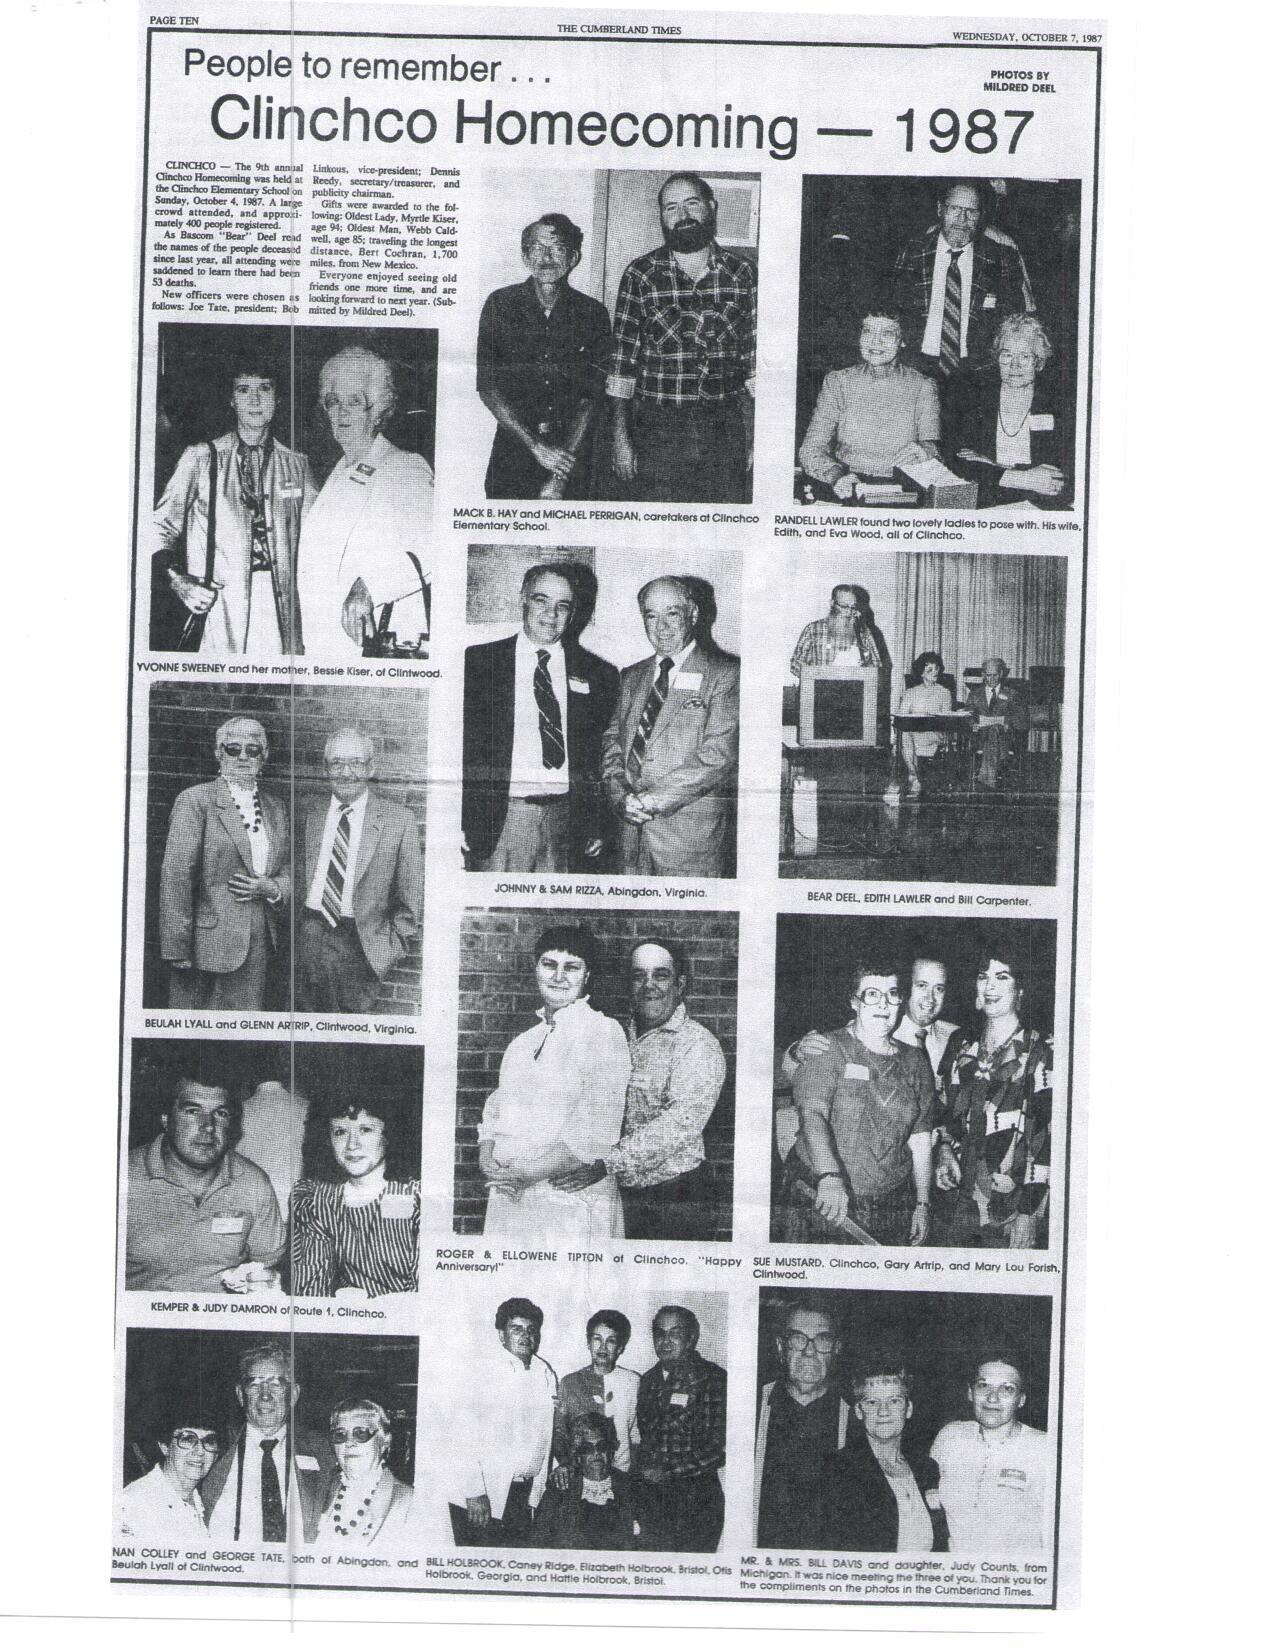 Clinchco1987-page-001.jpg